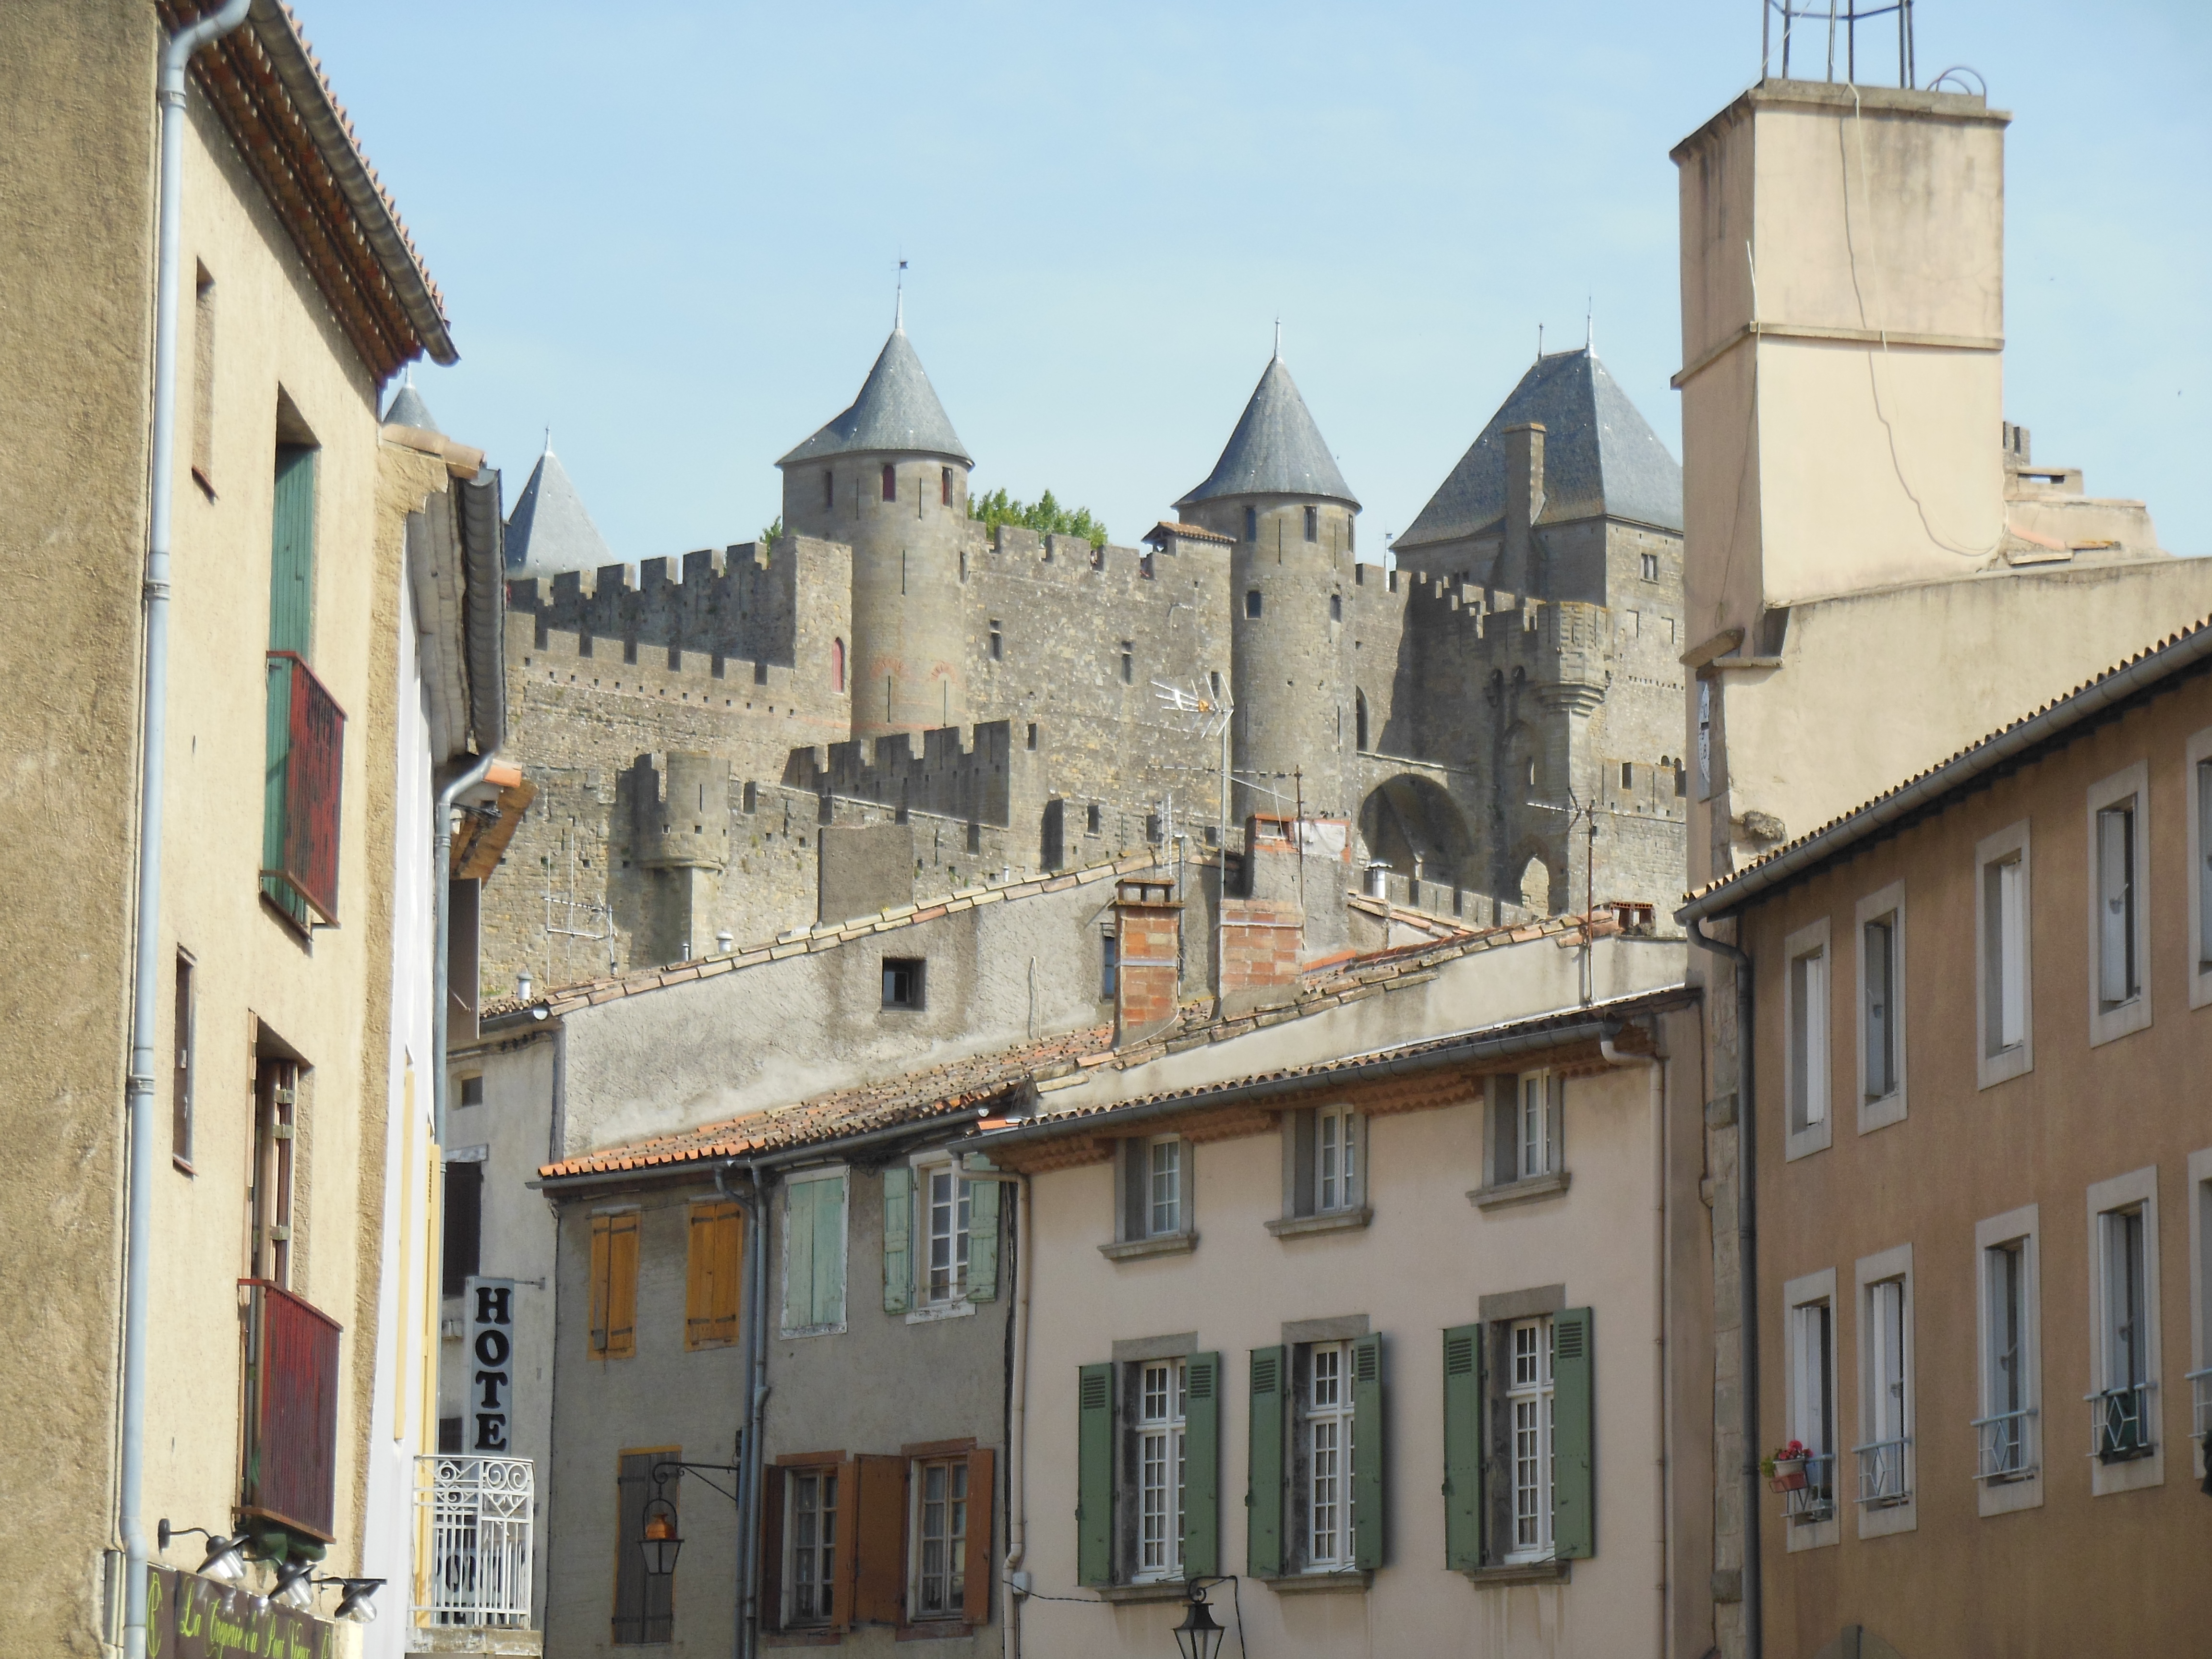 Carcassonne for a euro and 18 euros taxi fare putItOnTheSlate